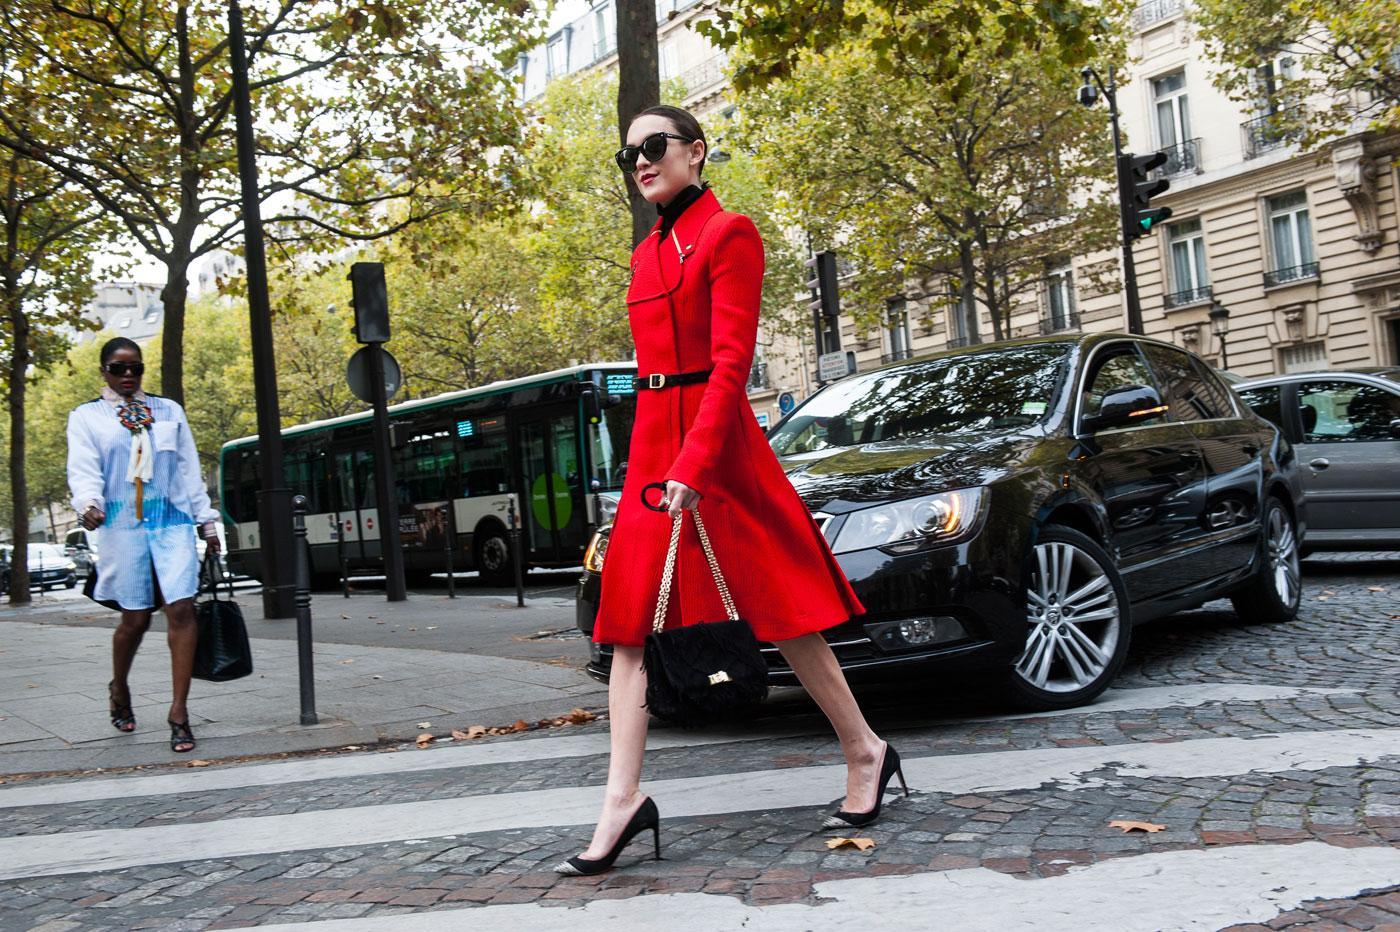 Le meilleur du street style de la fashion week de paris le figaro madame Style fashion week in la